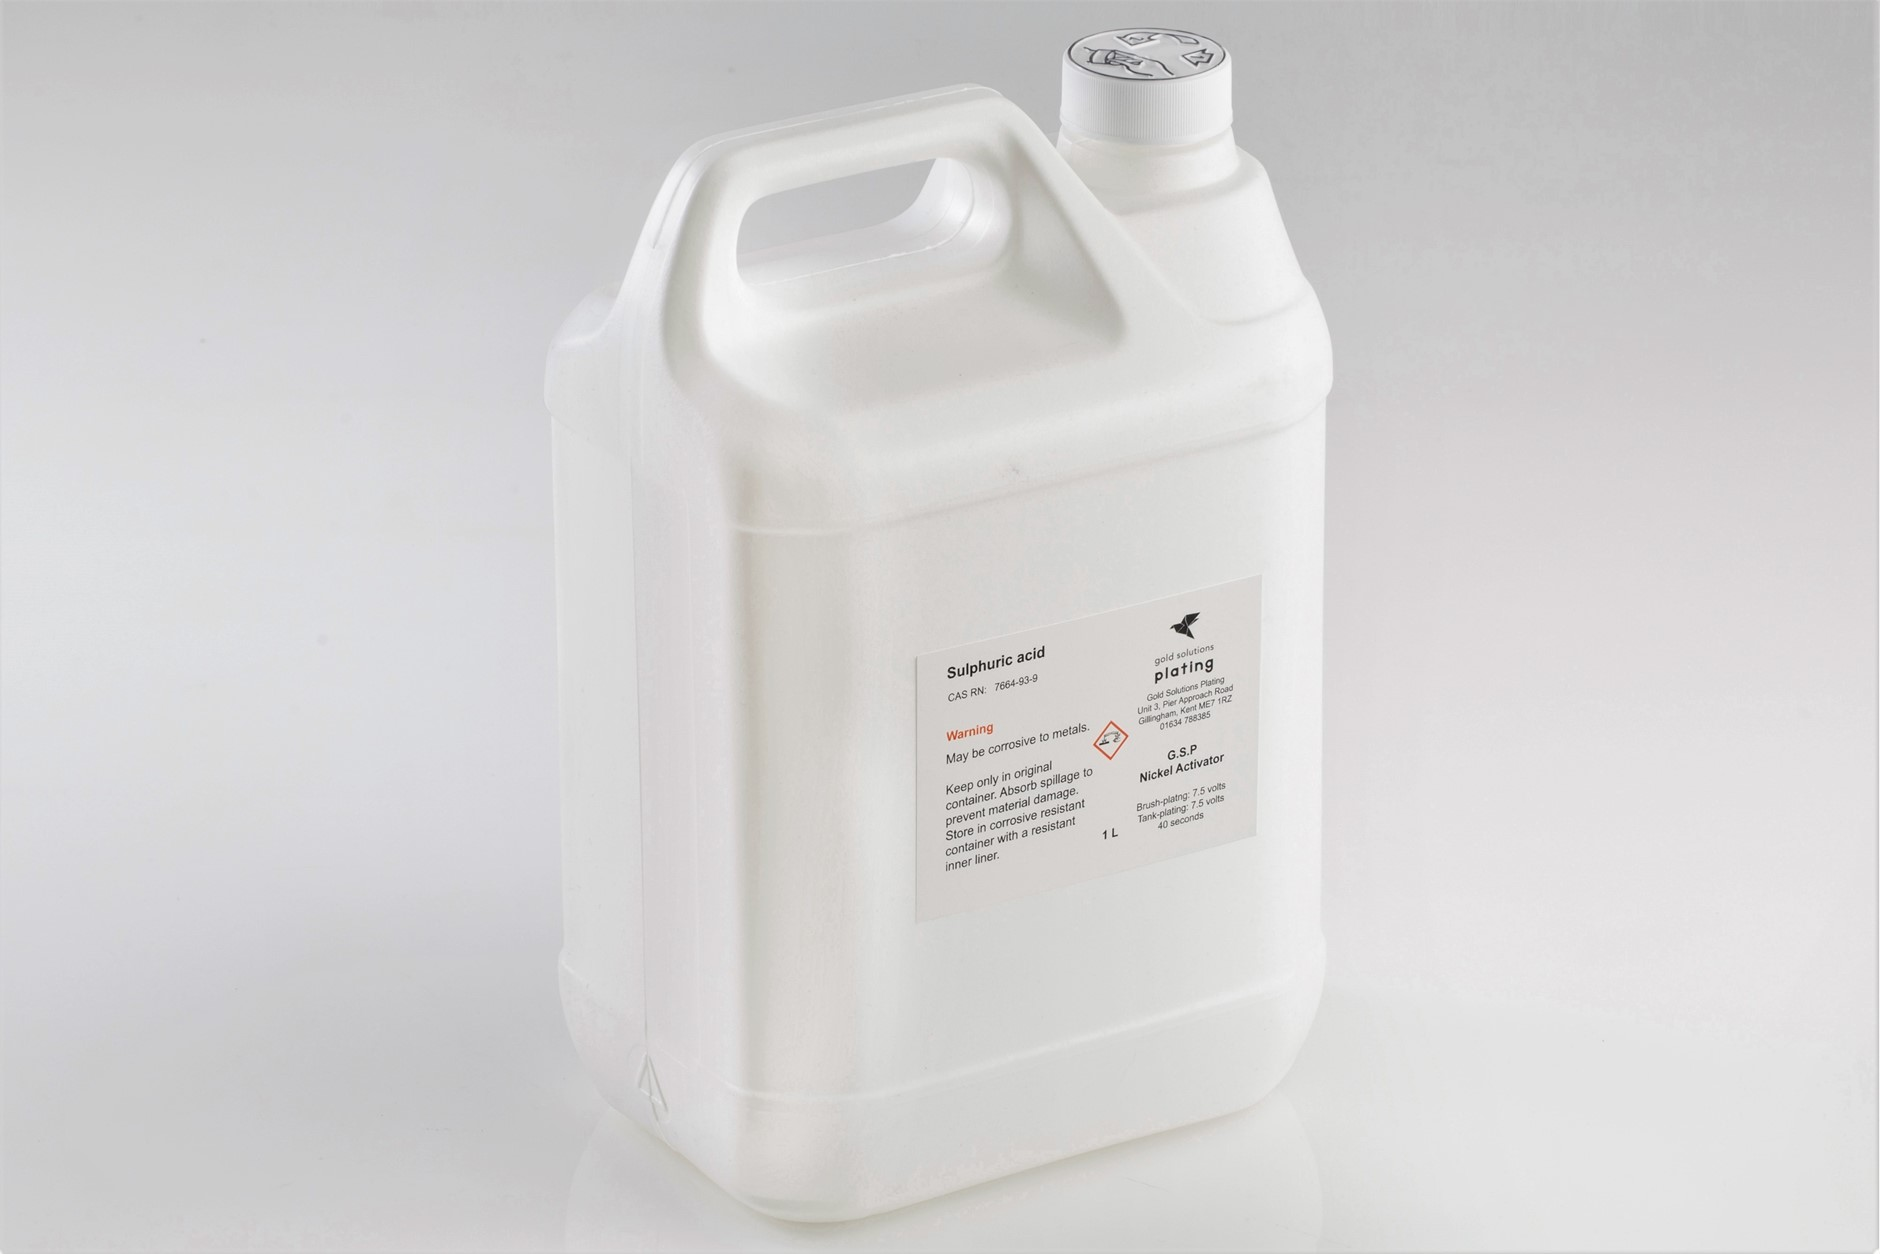 G.S.P Nickel Activator Solution, 5 litre bottle